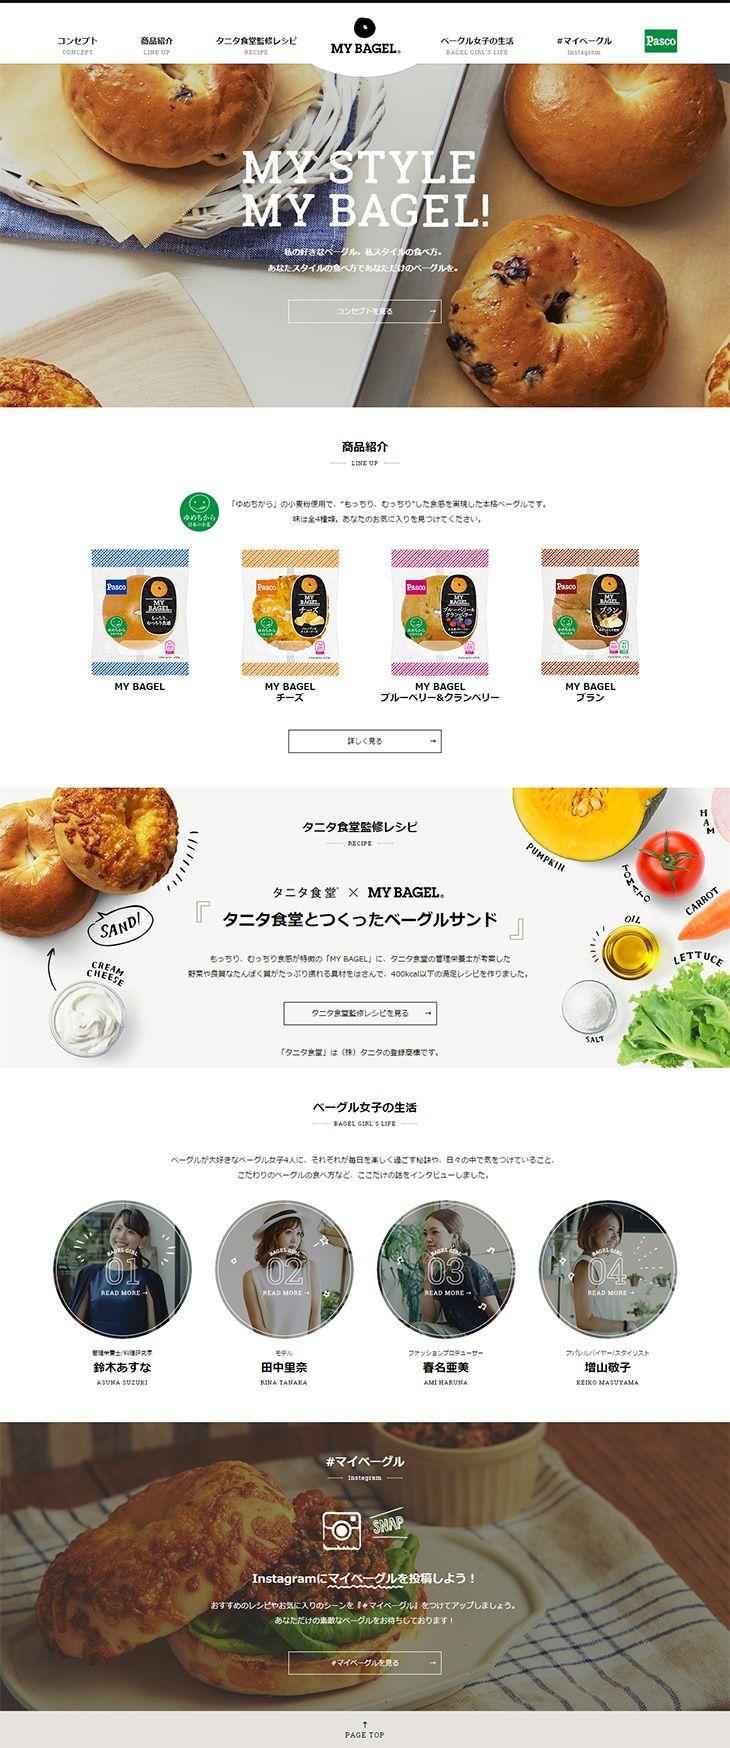 MY BAGEL【食品関連】のLPデザイン。WEBデザイナーさん必見!ランディングページのデザイン参考に(シンプル系)